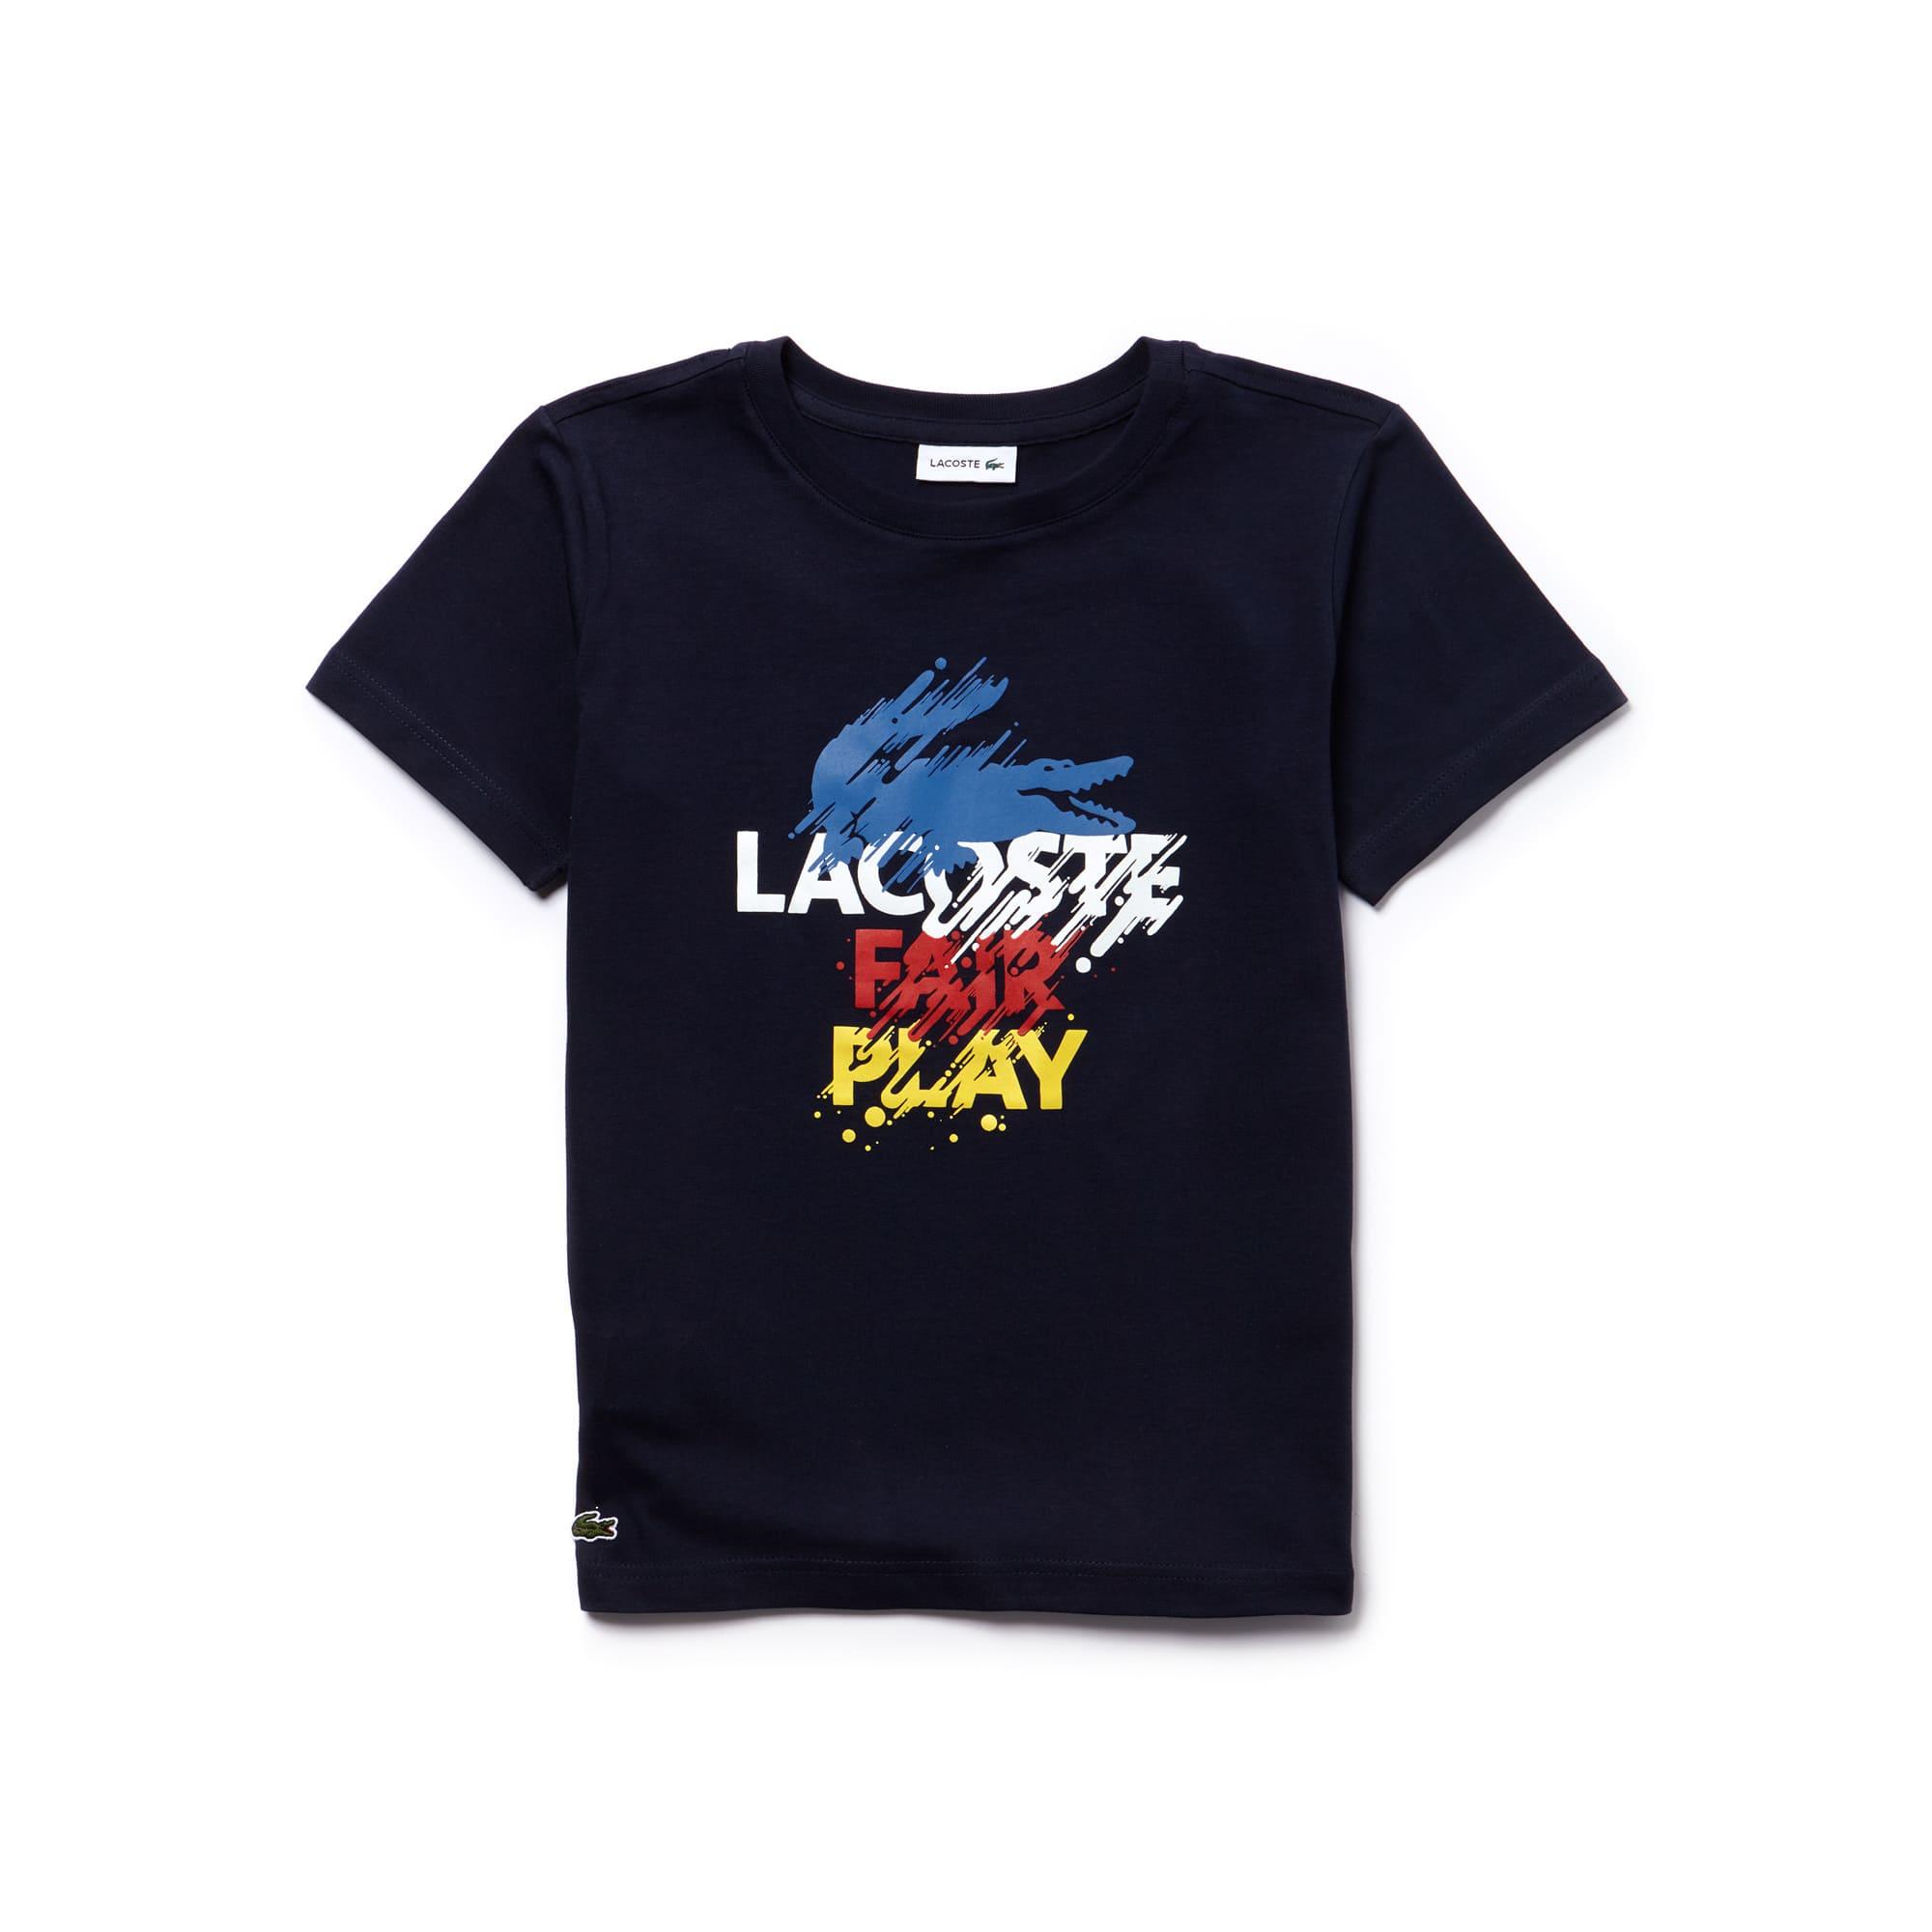 Jungen-T-Shirt aus Jersey mit buntem Druckmotiv